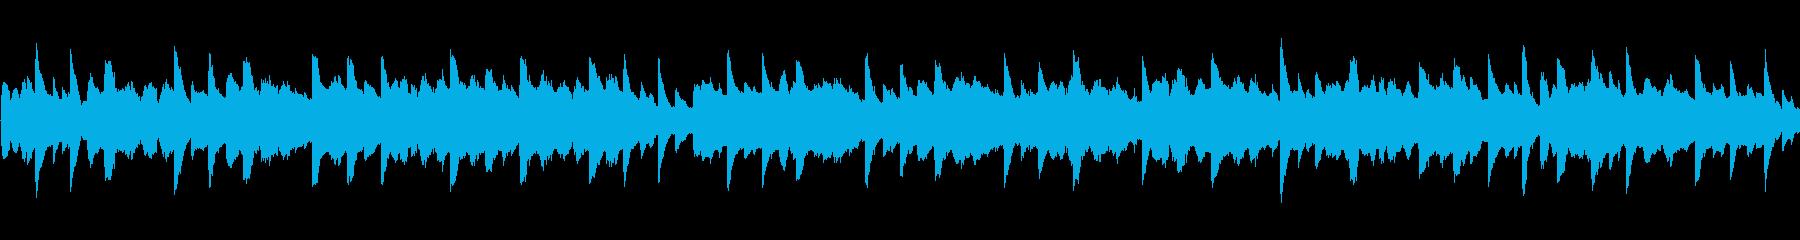 8bit Largo(ループ)の再生済みの波形